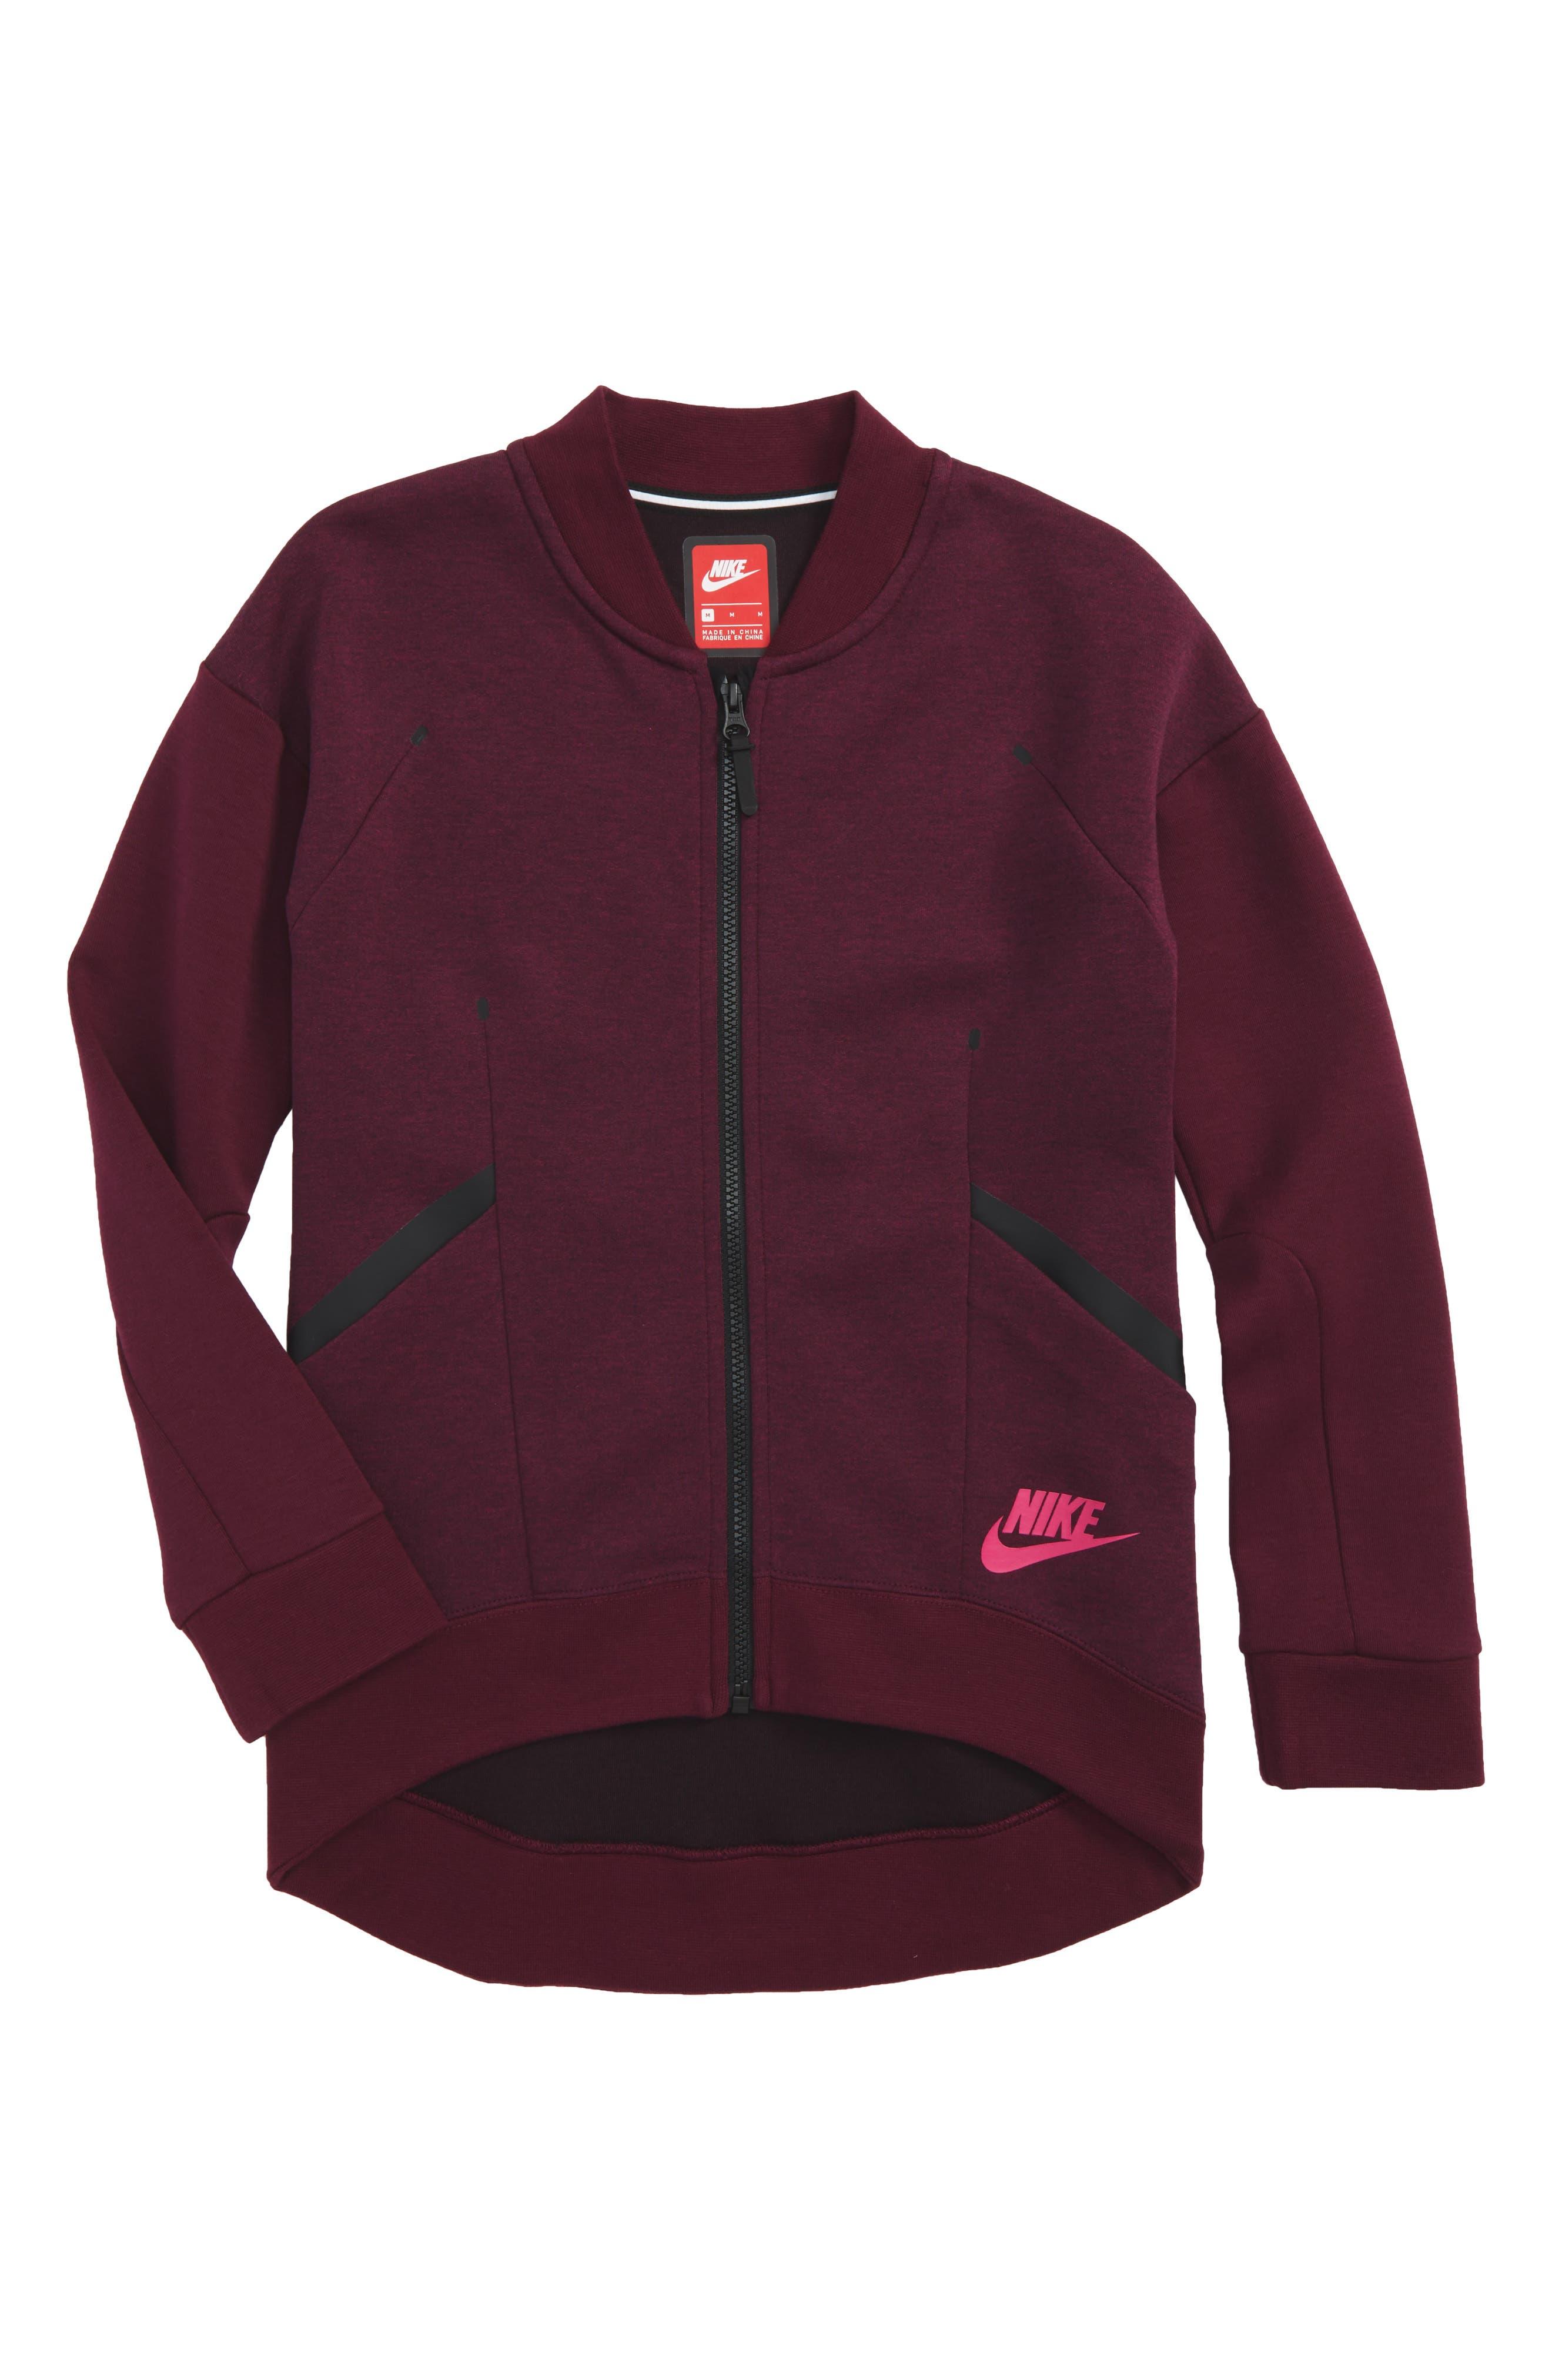 Tech Fleece Zip Jacket,                         Main,                         color, Bordeaux/ Active Pink